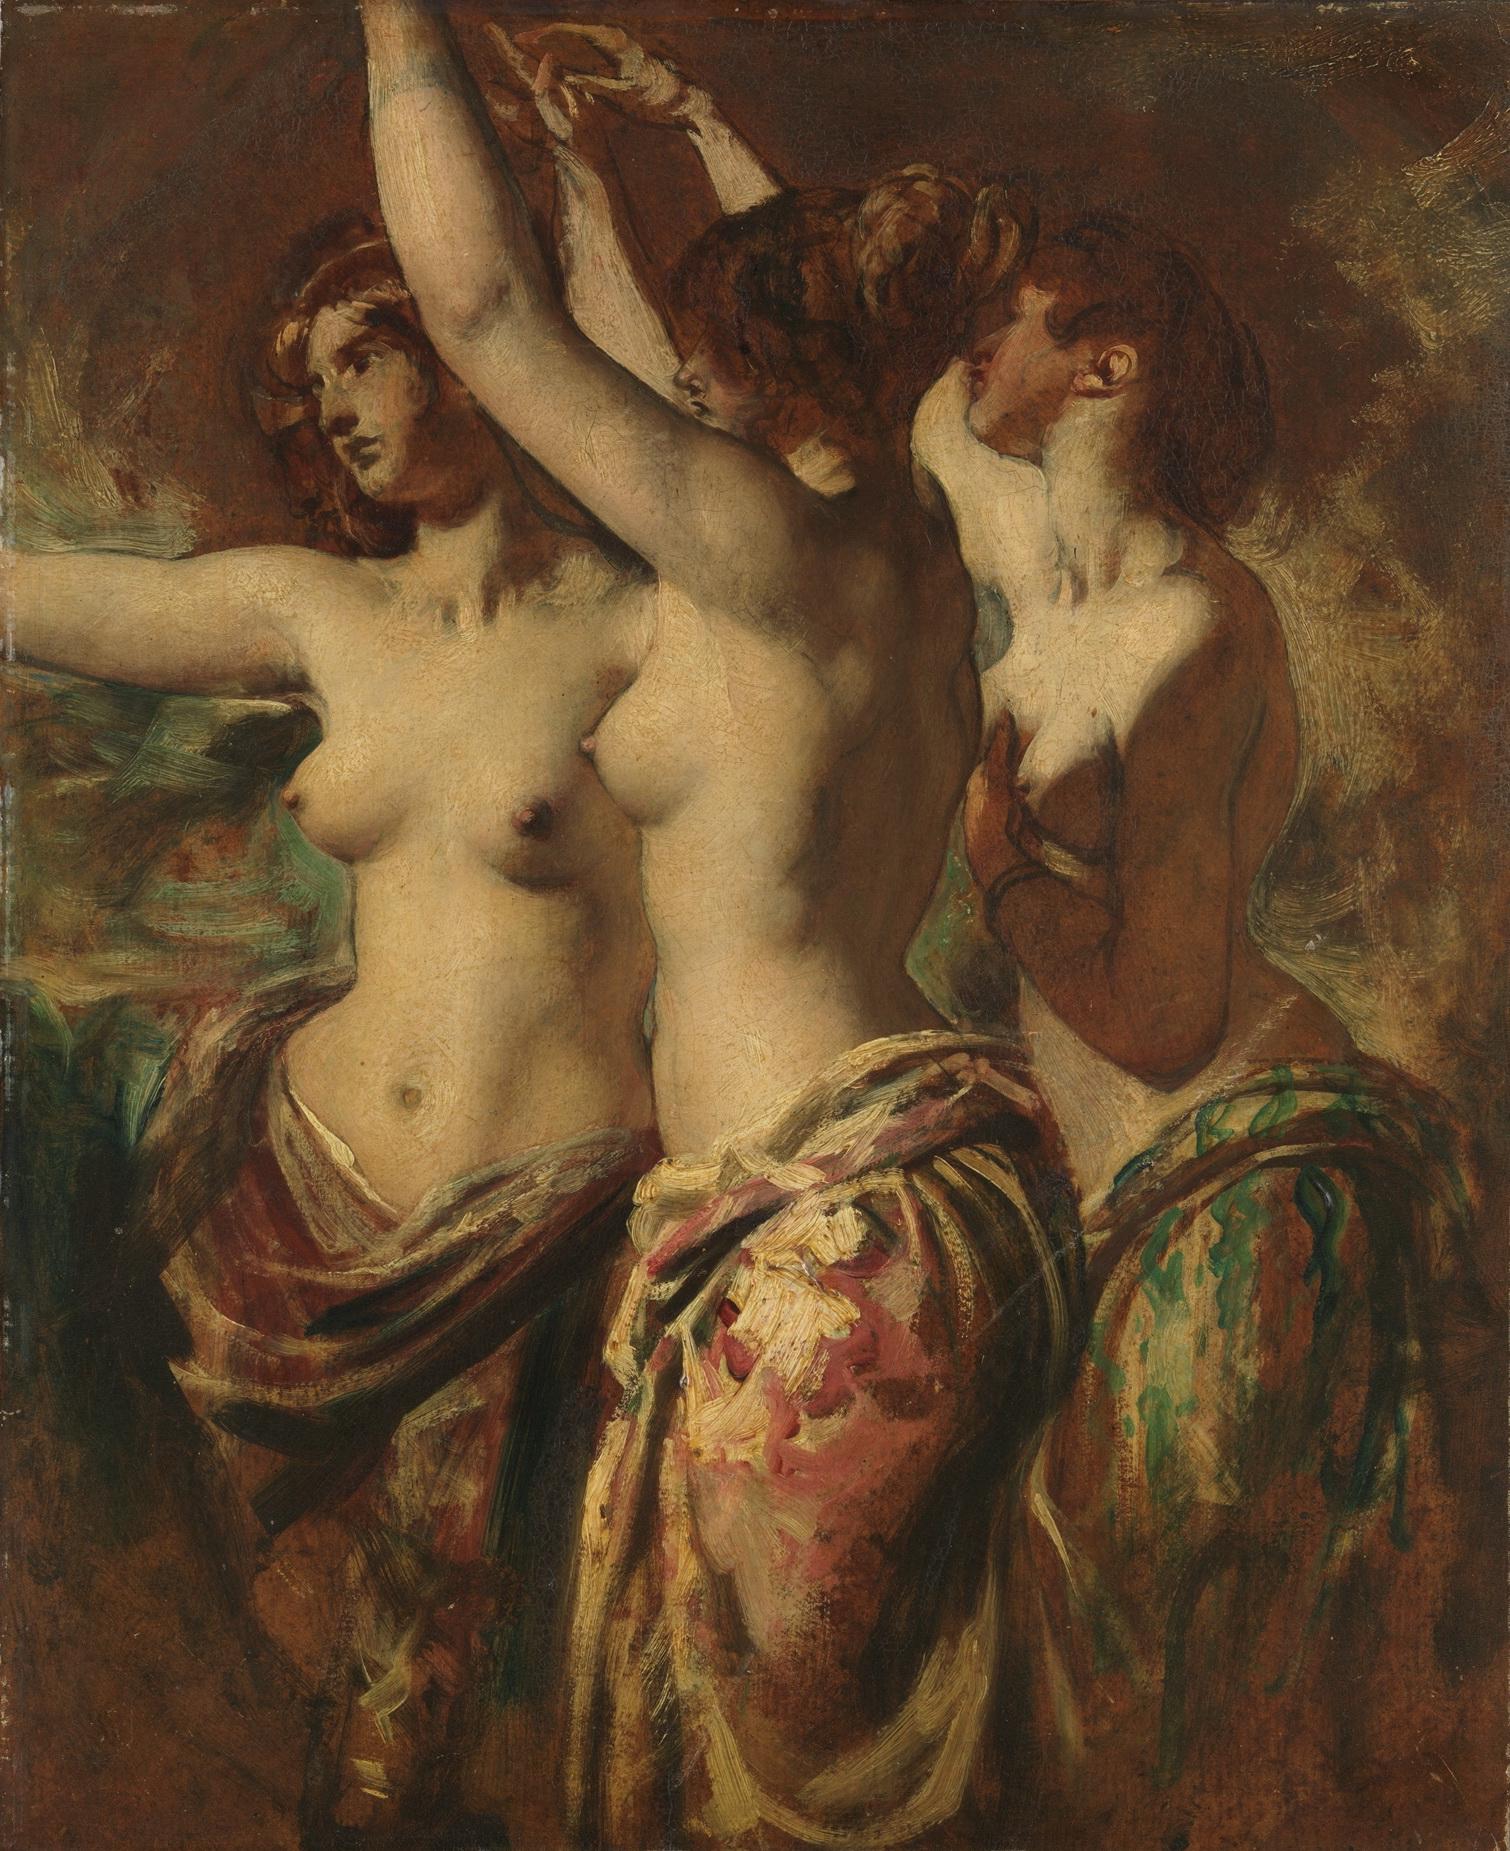 William Etty, 1787-1849. Три грации. 57.2 x 47.6 см. Нью-Йорк, Метрополитен